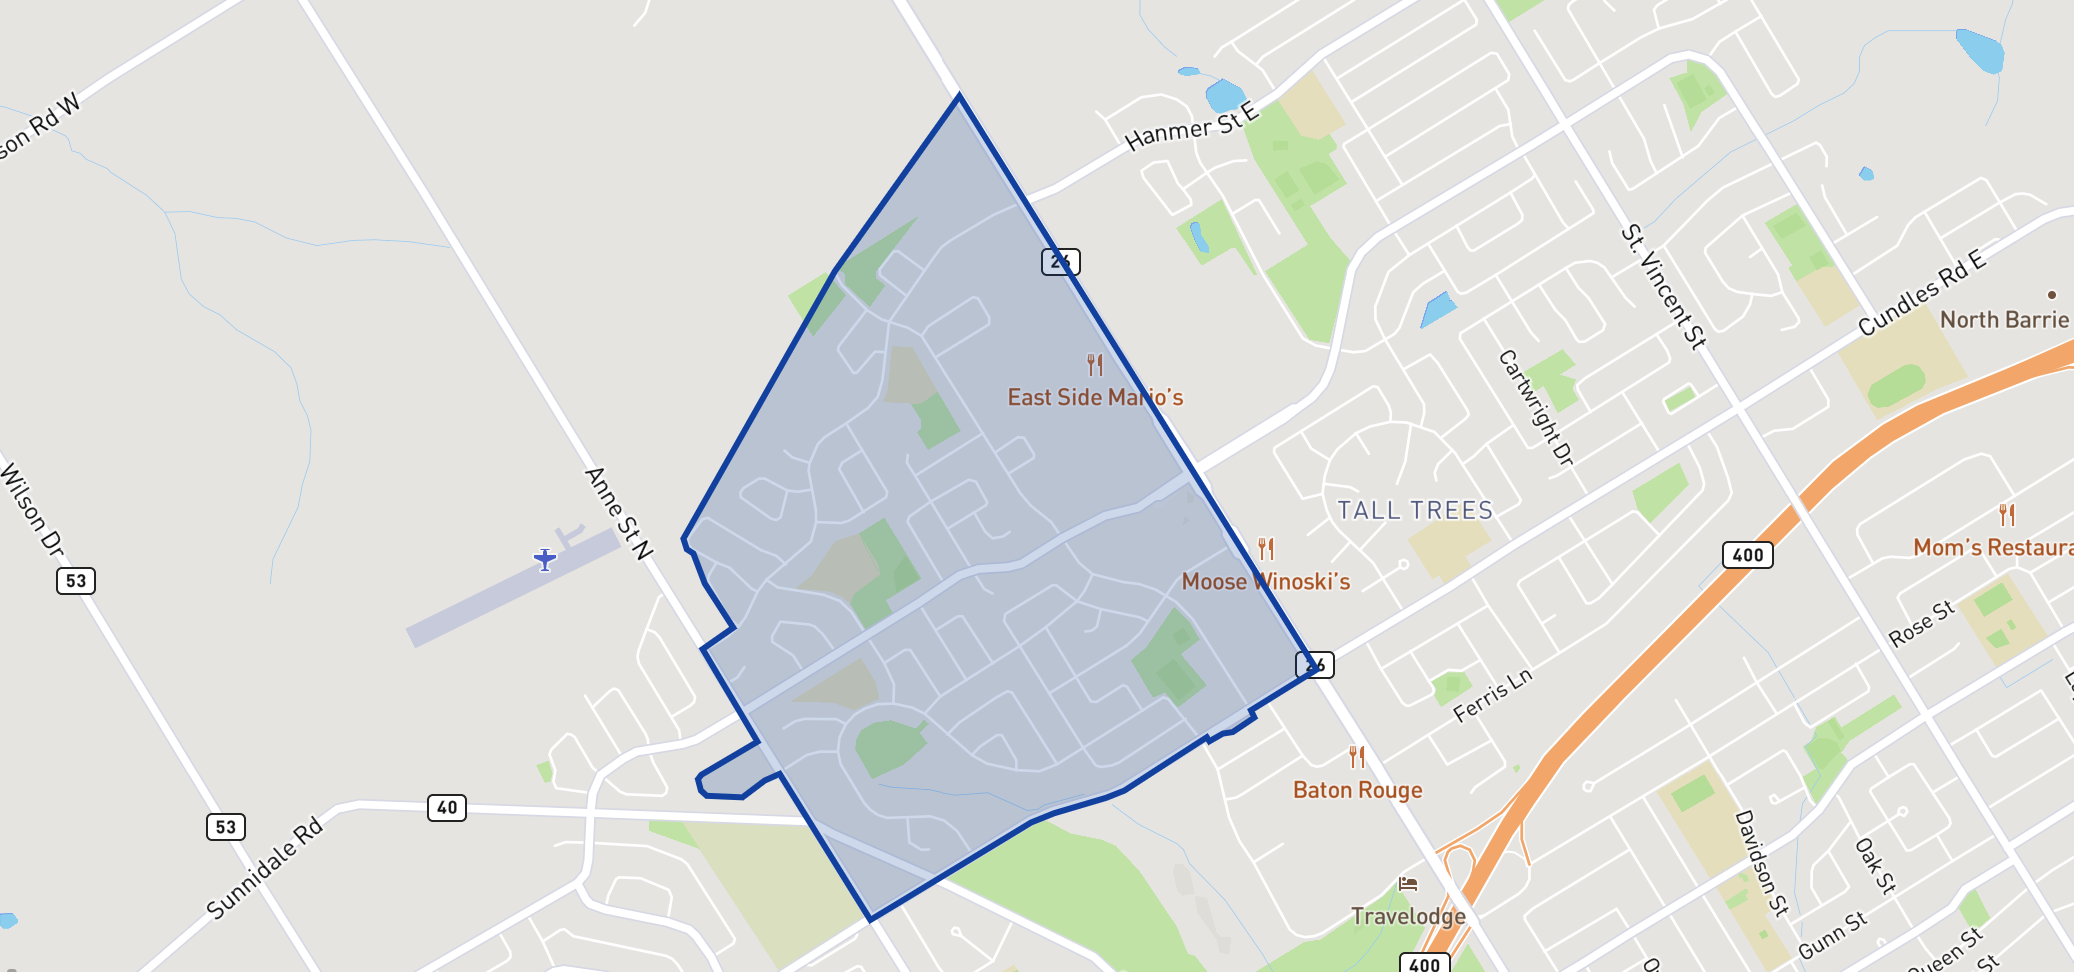 West Bayfield Elementary School  neighbourhood borders